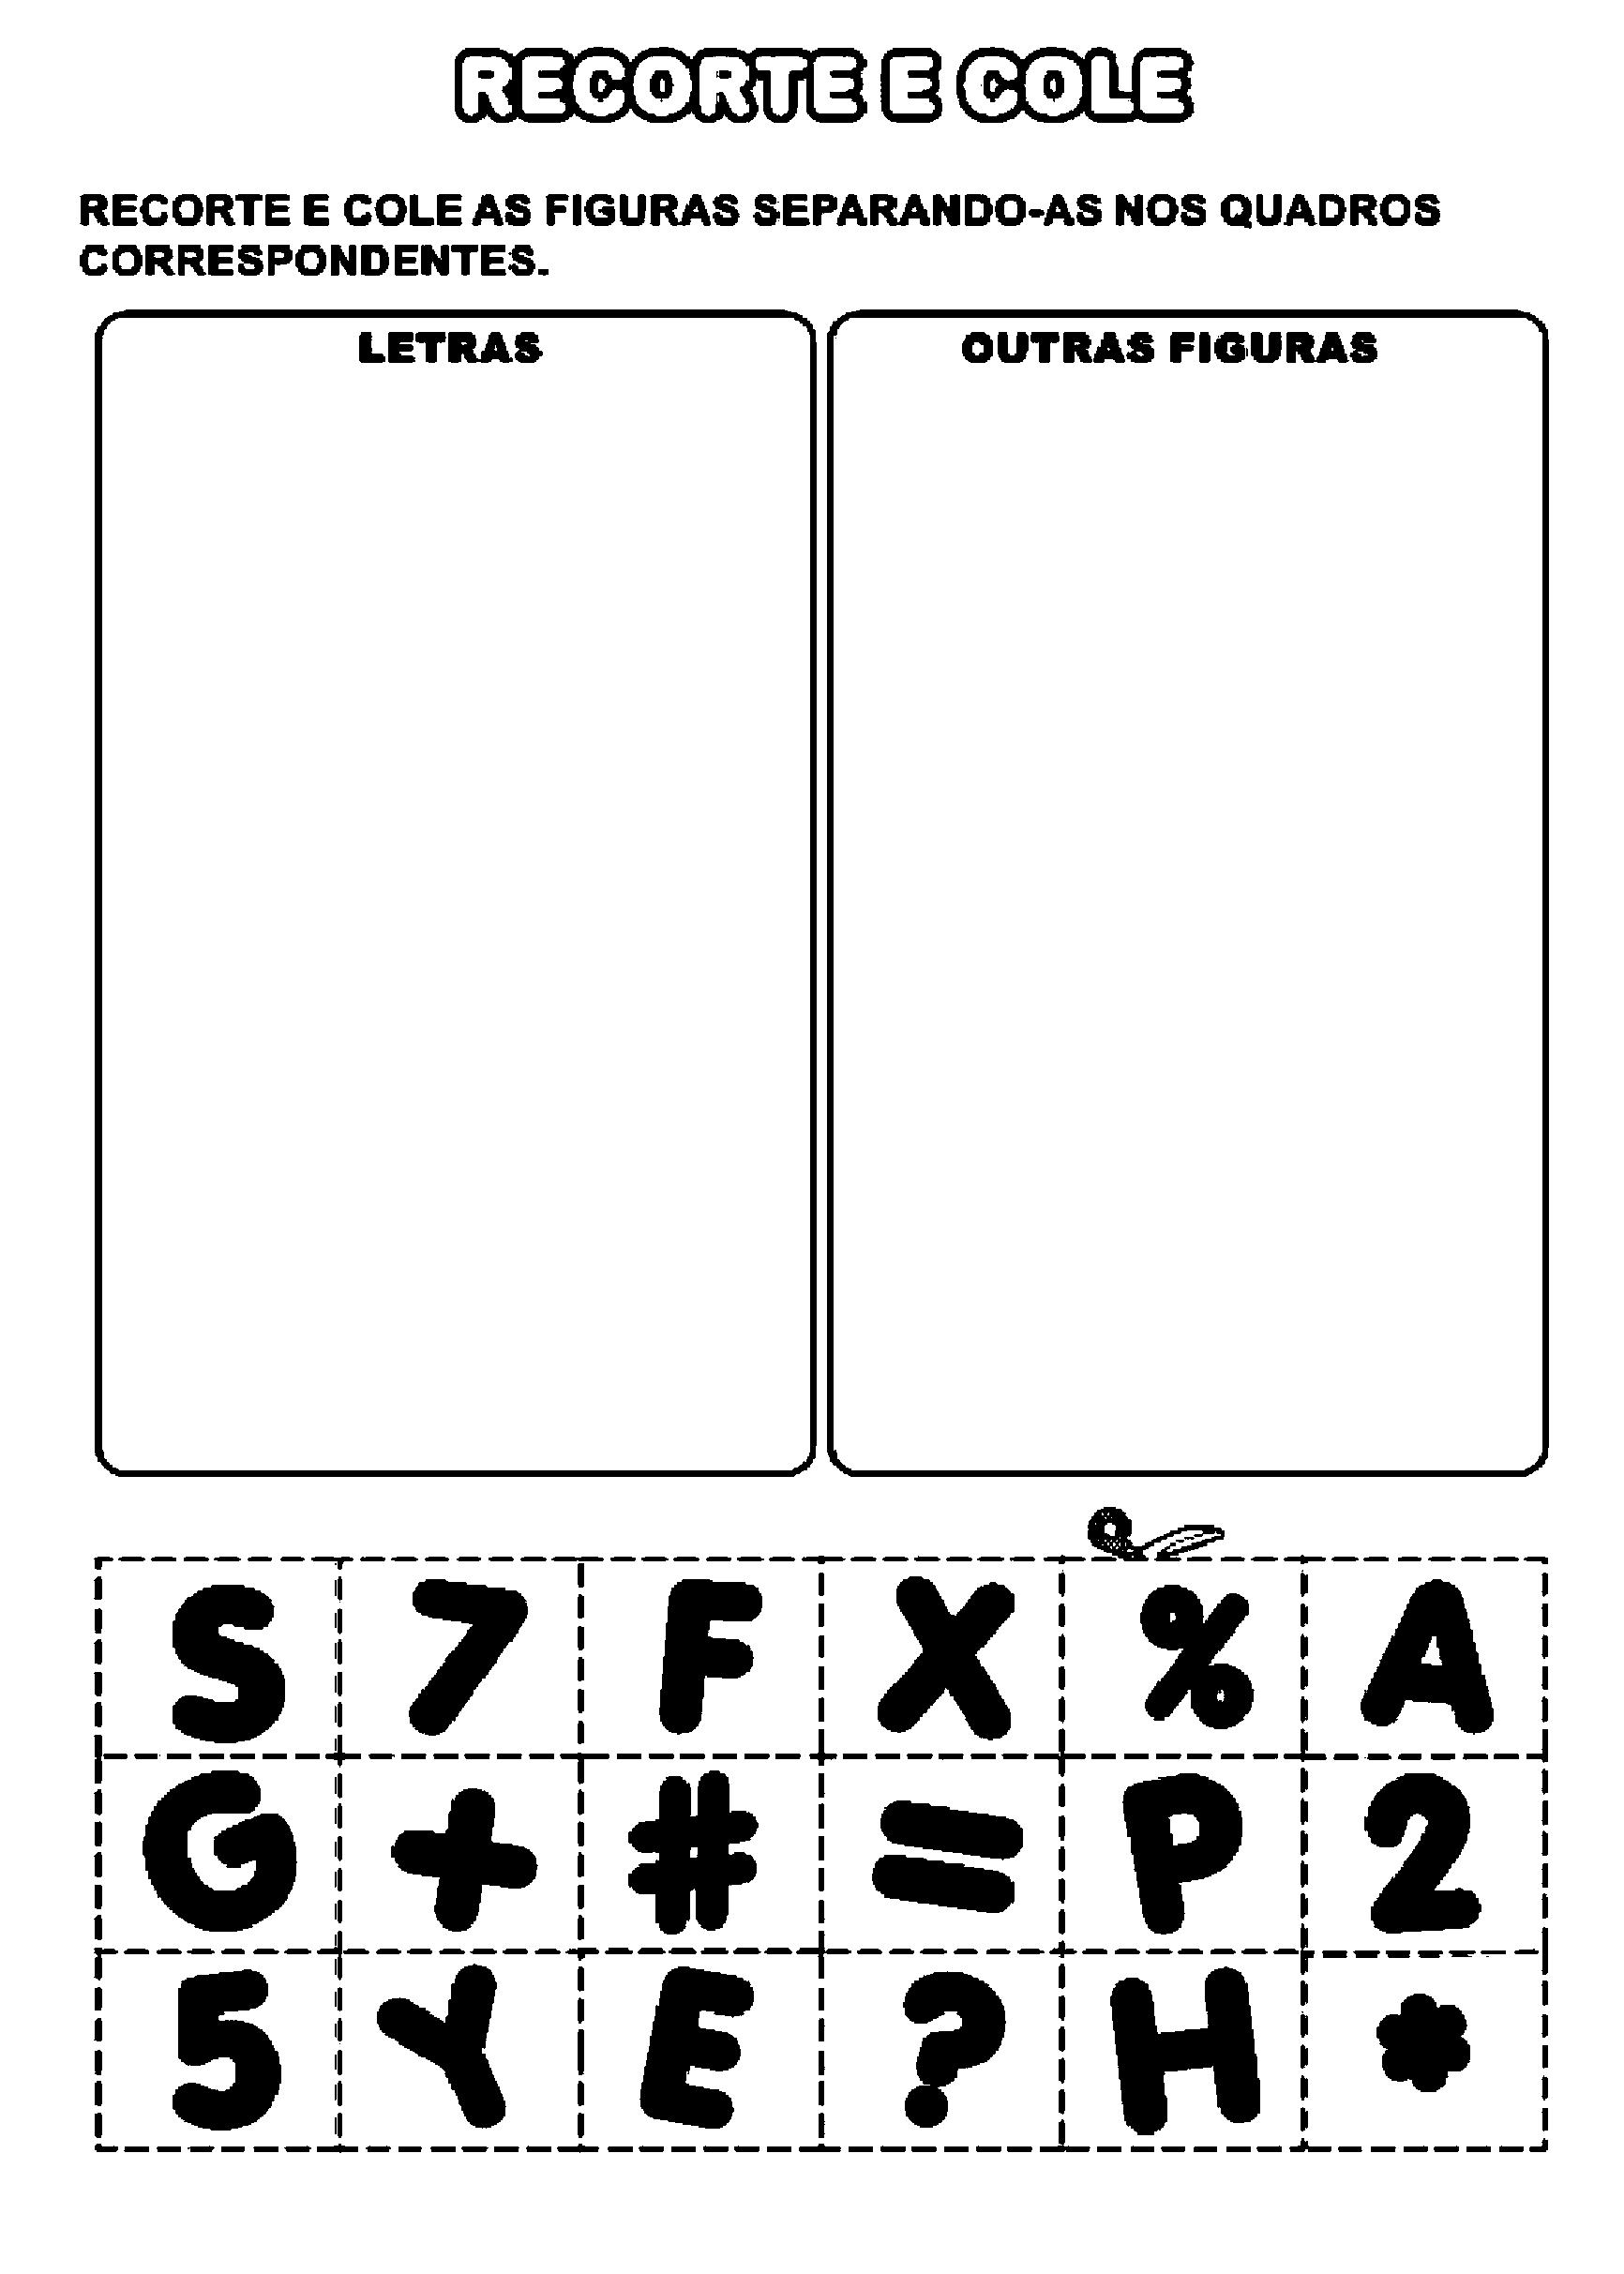 Atividade de diferenciar letras de demais figuras